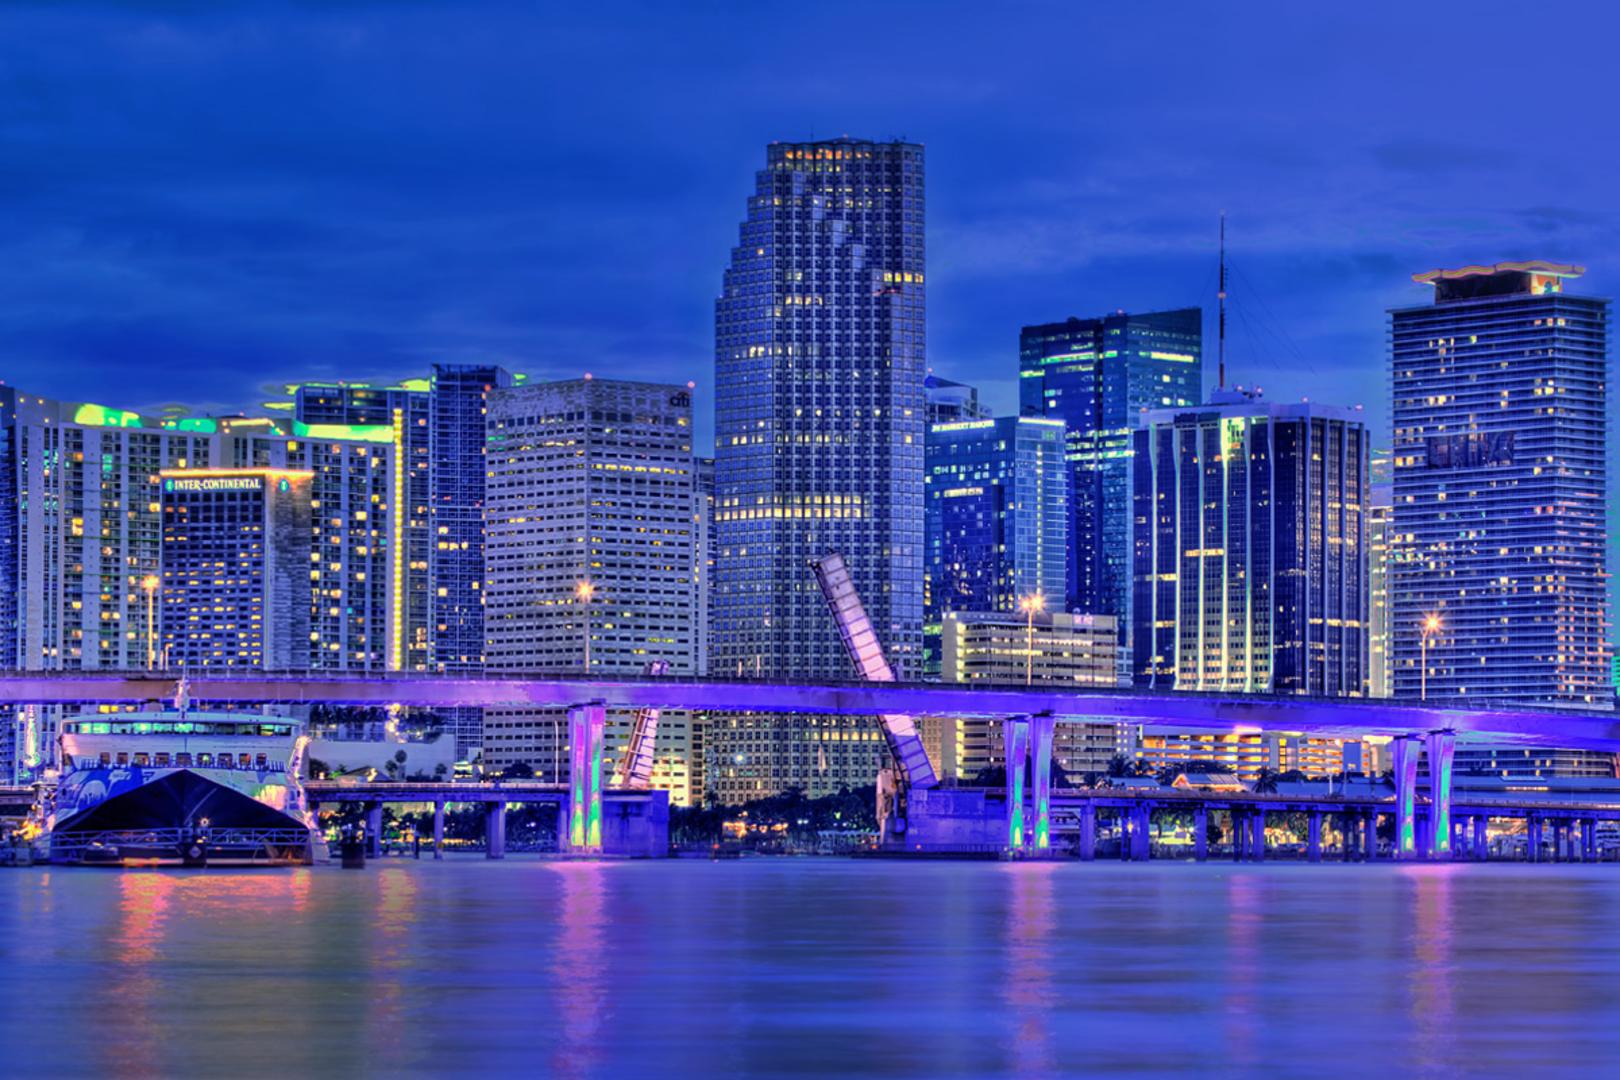 miami florida skyline wallpaper Miami At Night Skyline Wallpaper 4875 1620x1080